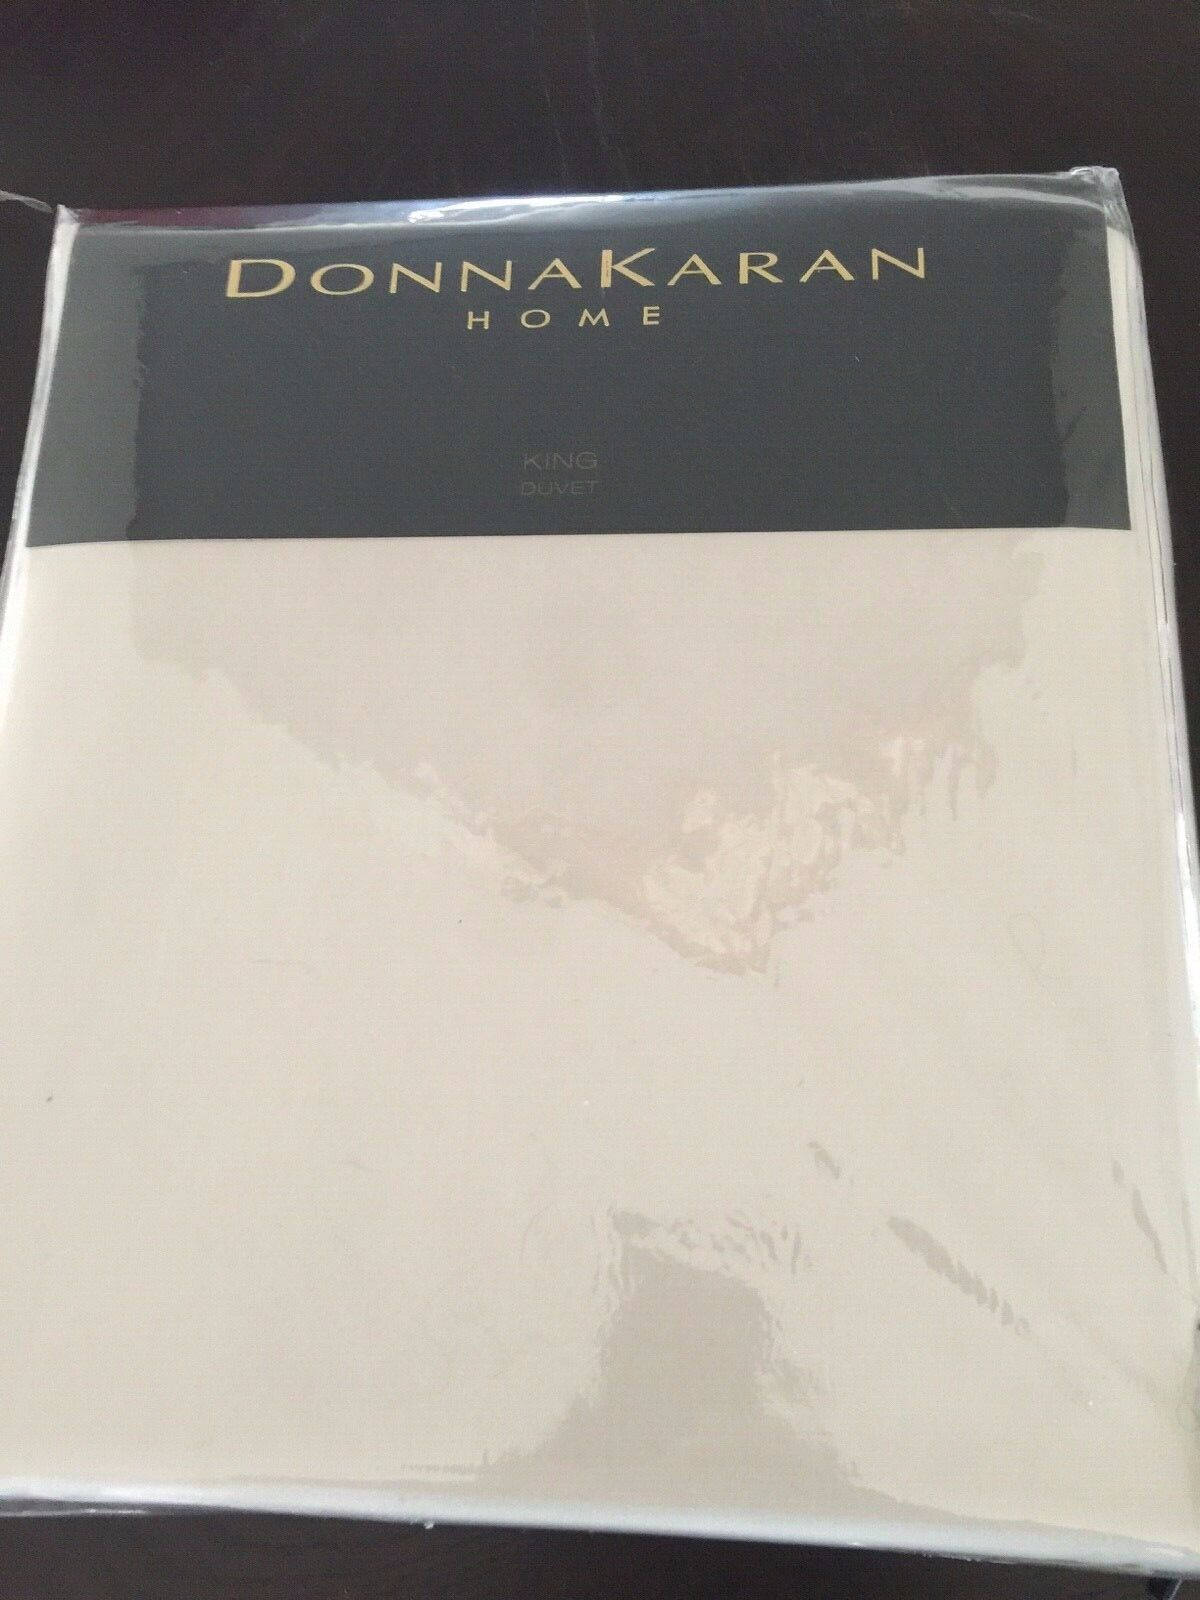 women Karan King Duvet Cover Ultra Fine 600 tc Cotton New Platinum